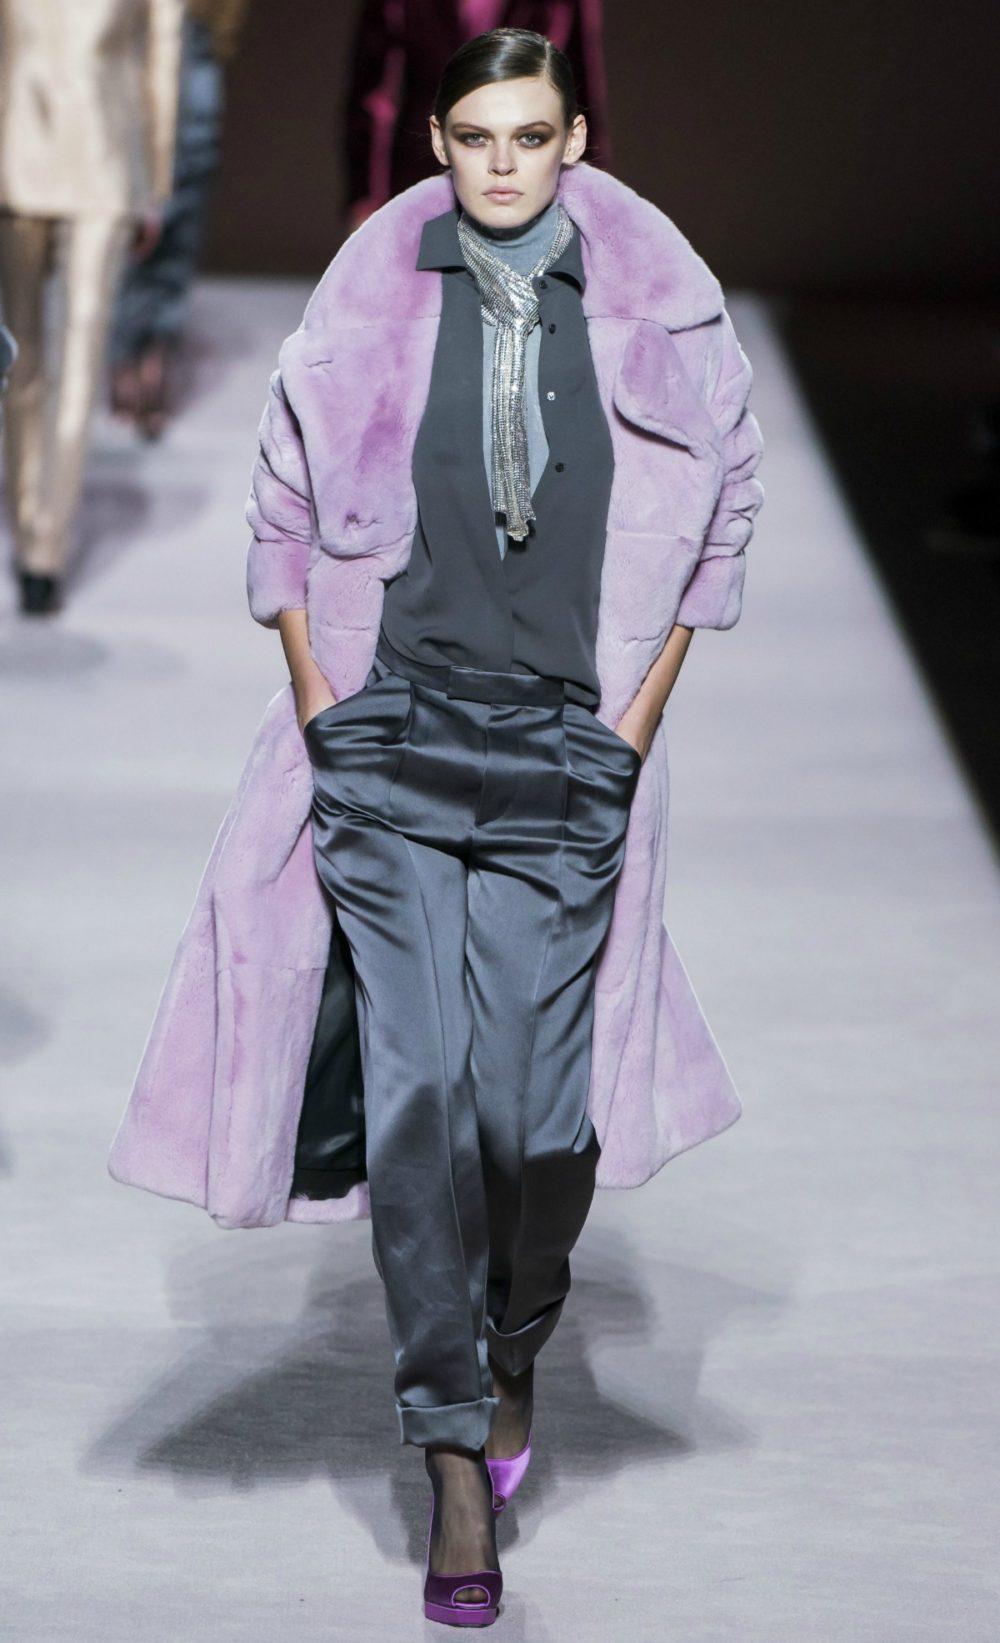 2019 Fall Fashion Trends to Wear Now I Lilac Overcoat on Tom Ford FW19 Runway #FallFashion #Runway #Trends #FashionBlog #Styleinspo